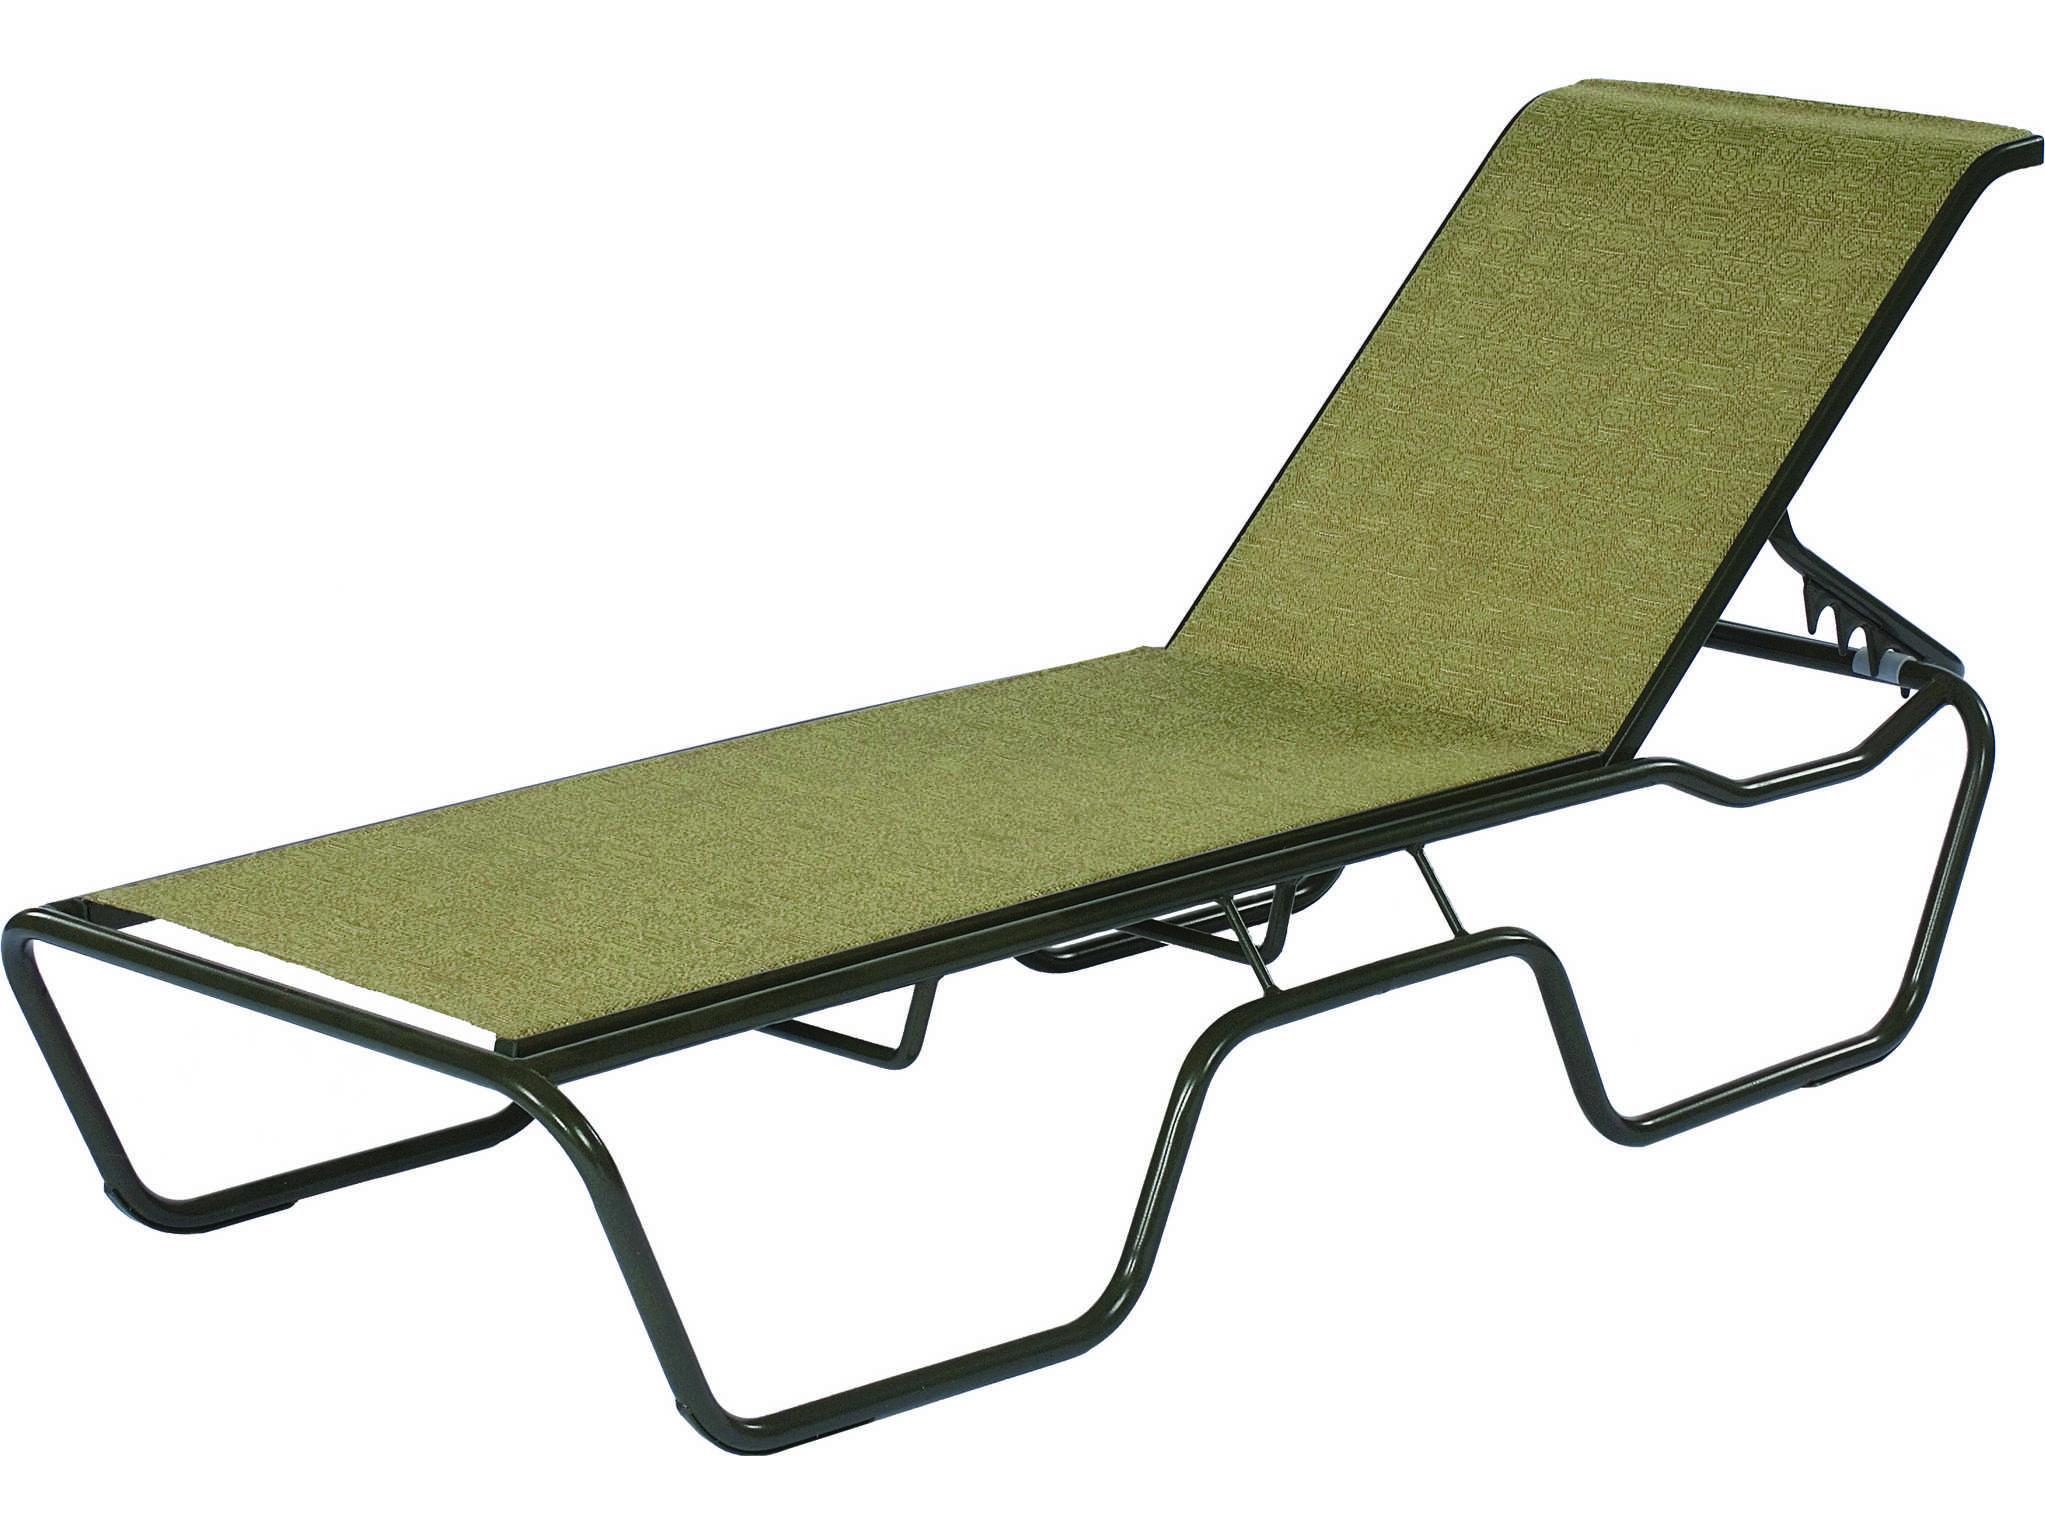 Suncoast sanibel sling cast aluminum stackable chaise 1913 for Chaise longue aluminium